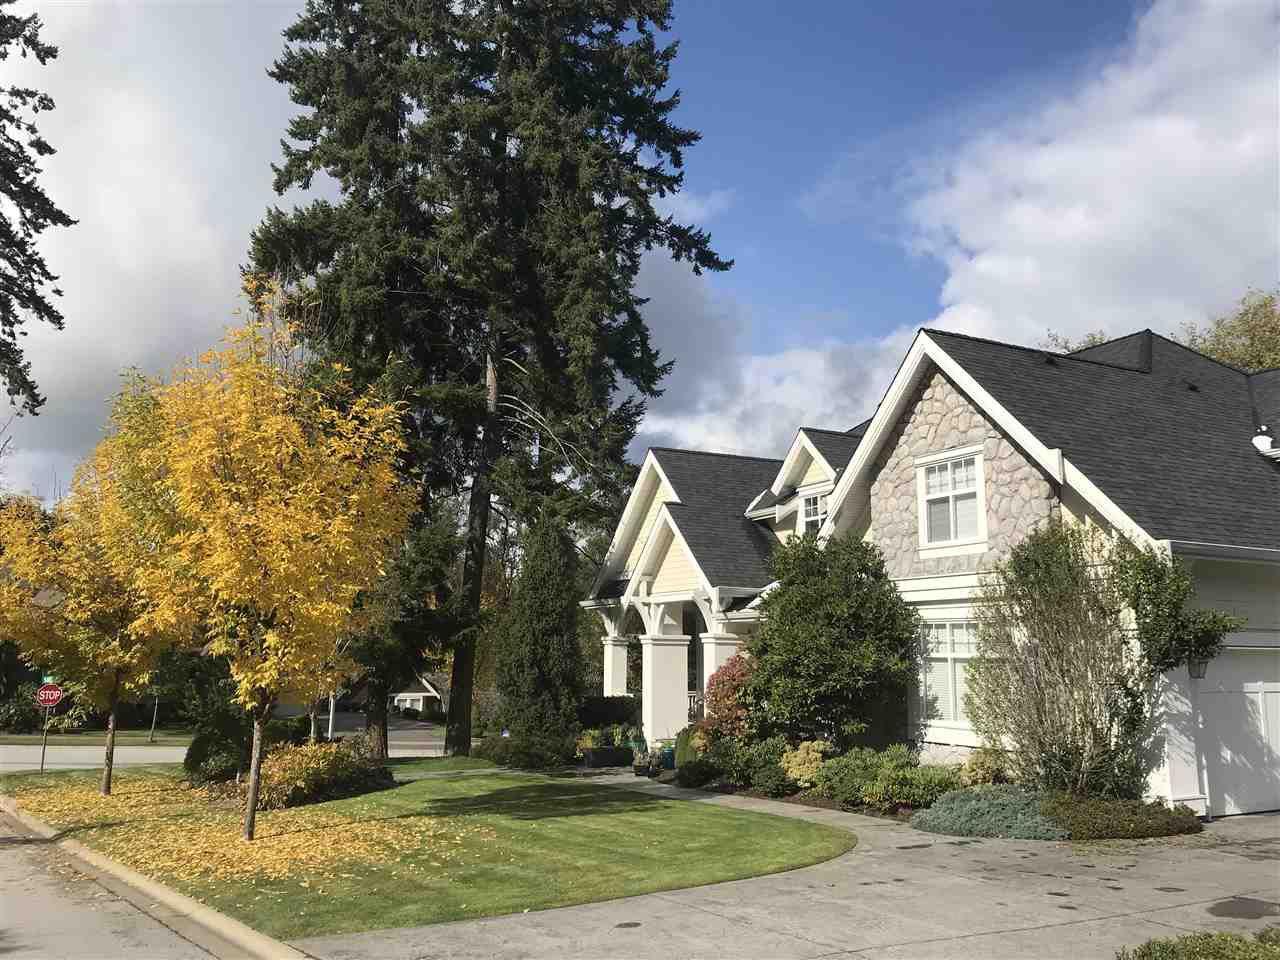 "Main Photo: 14615 29 Avenue in Surrey: Elgin Chantrell House for sale in ""Elgin/Chantrell"" (South Surrey White Rock)  : MLS®# R2214100"